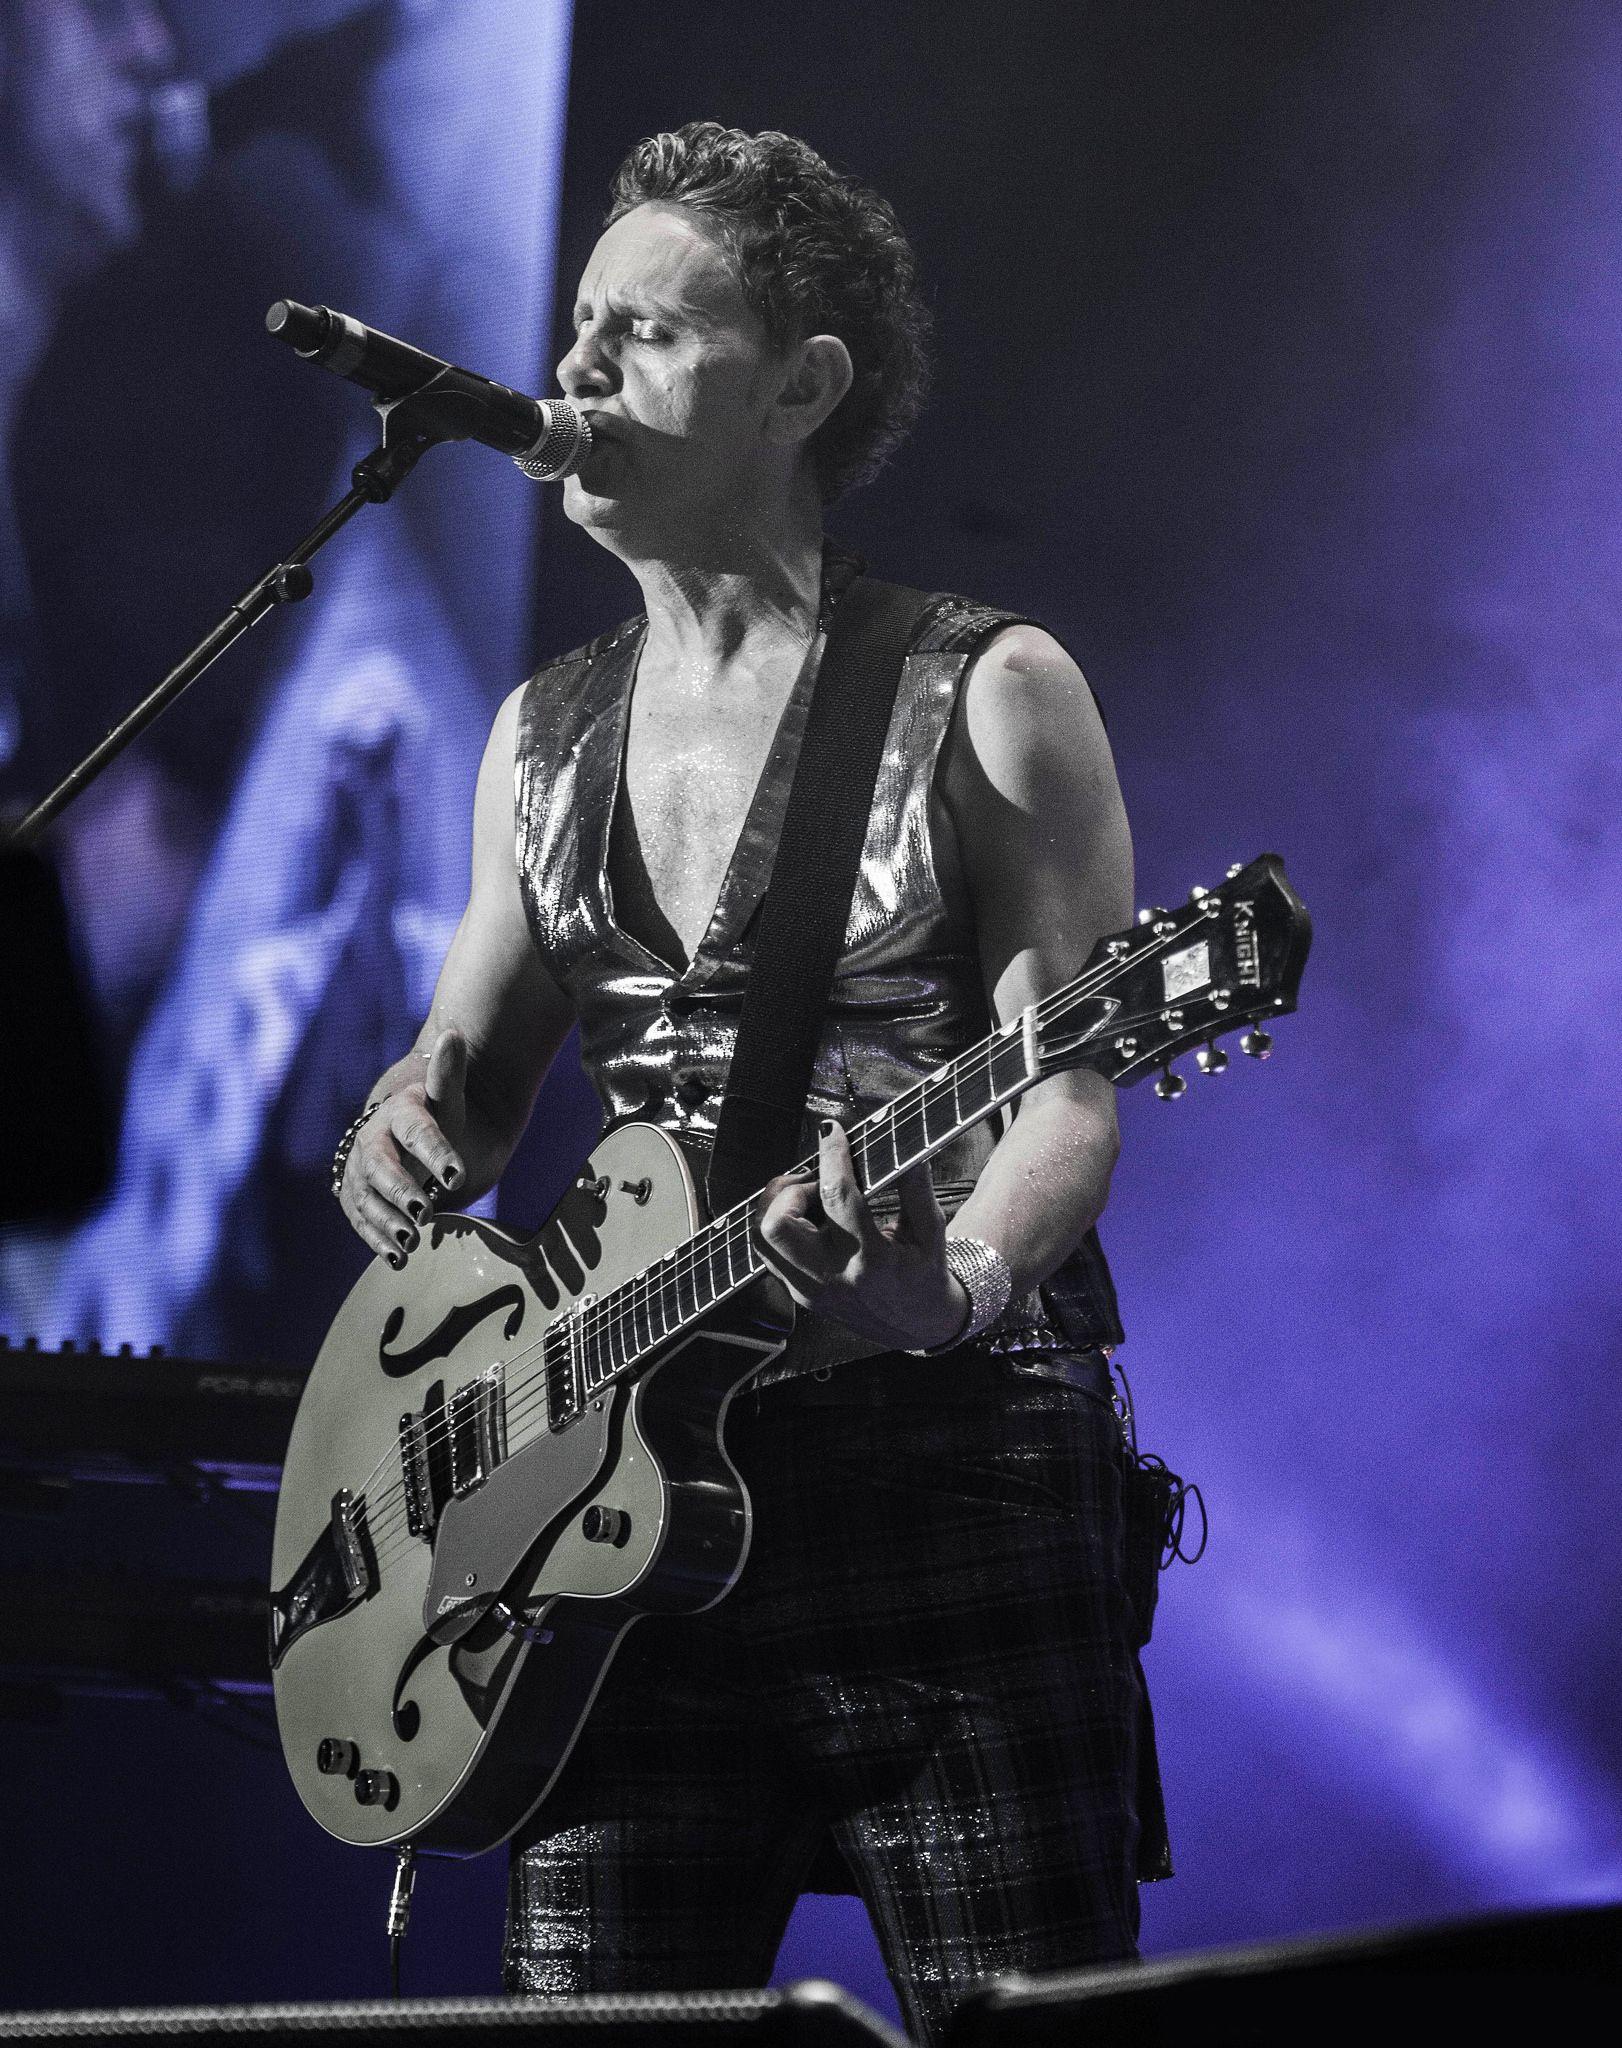 Pin by Szamák Csilla on Depeche Mode ❤️